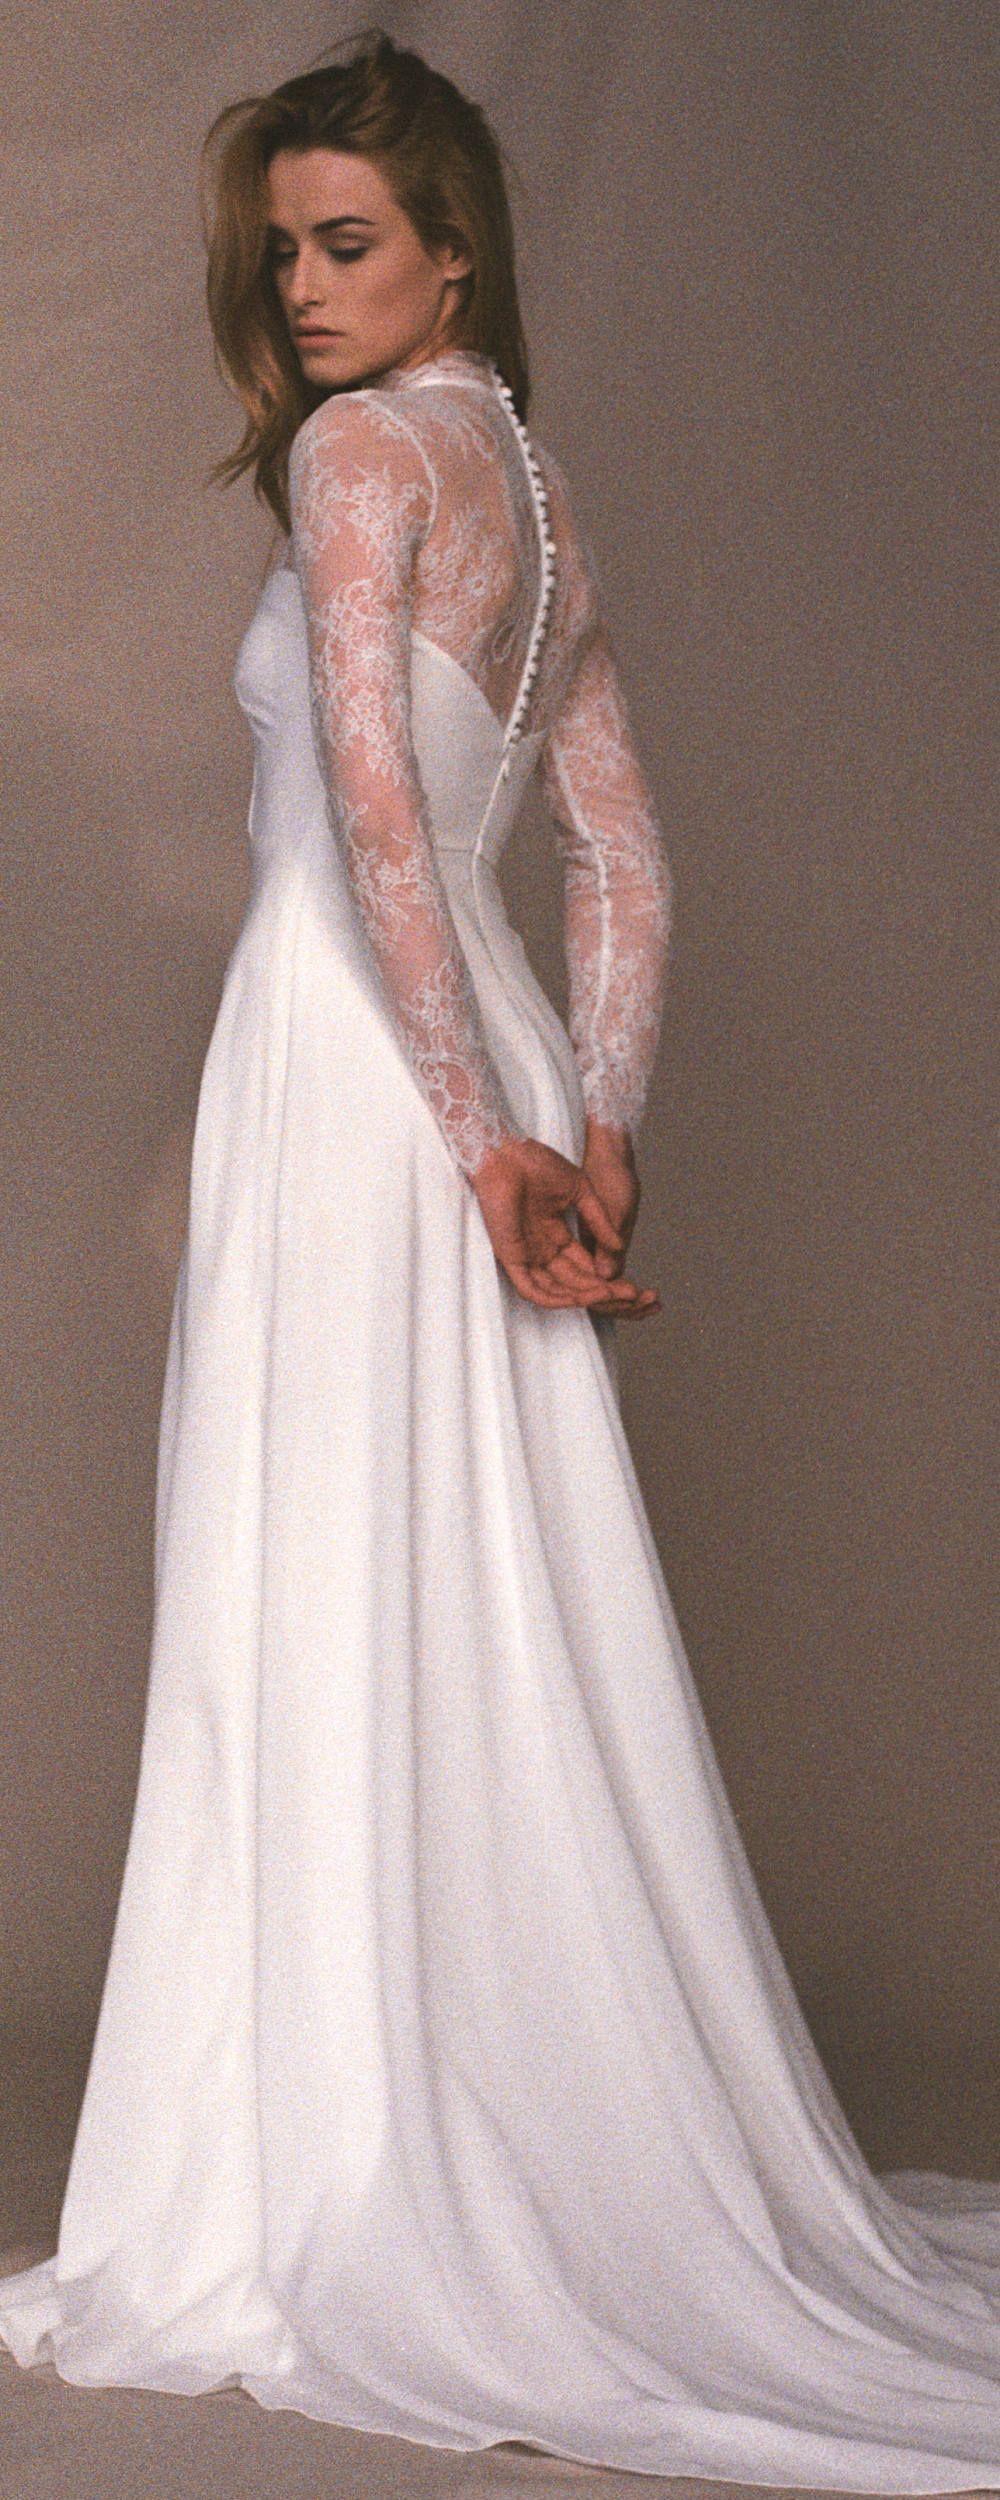 Long sleeve ivory wedding dress  Lace wedding dress  High neck light ivory wedding gown  Offwhite